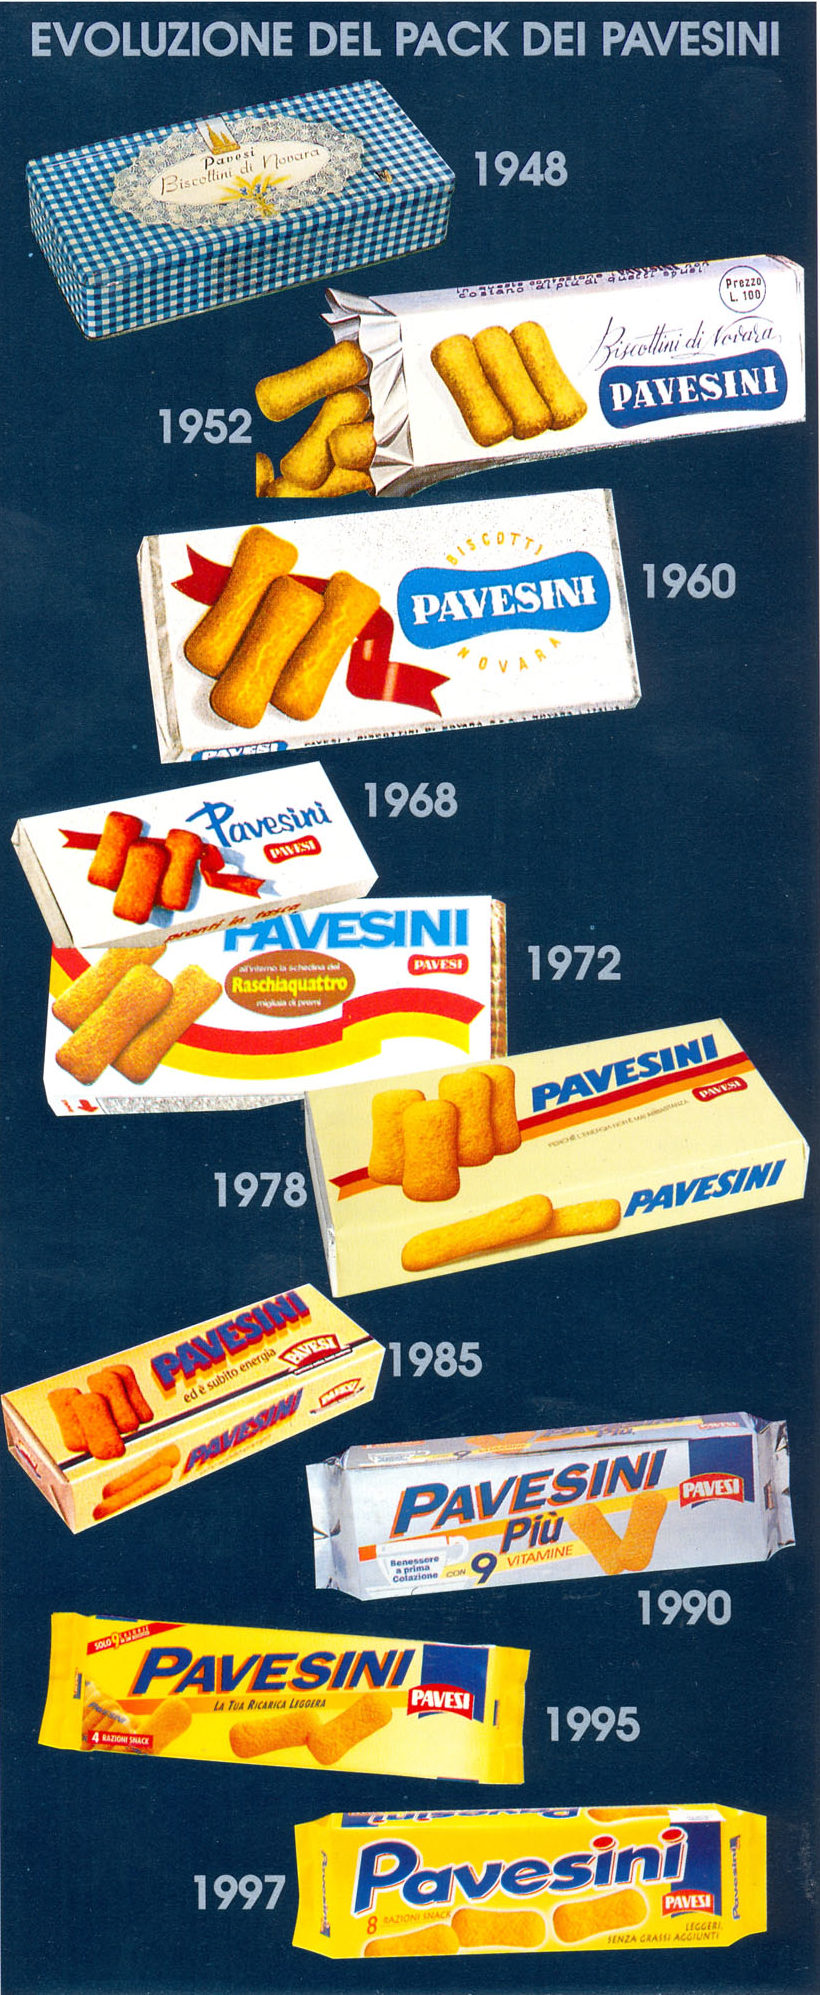 History - evolution of Pavesini's packaging